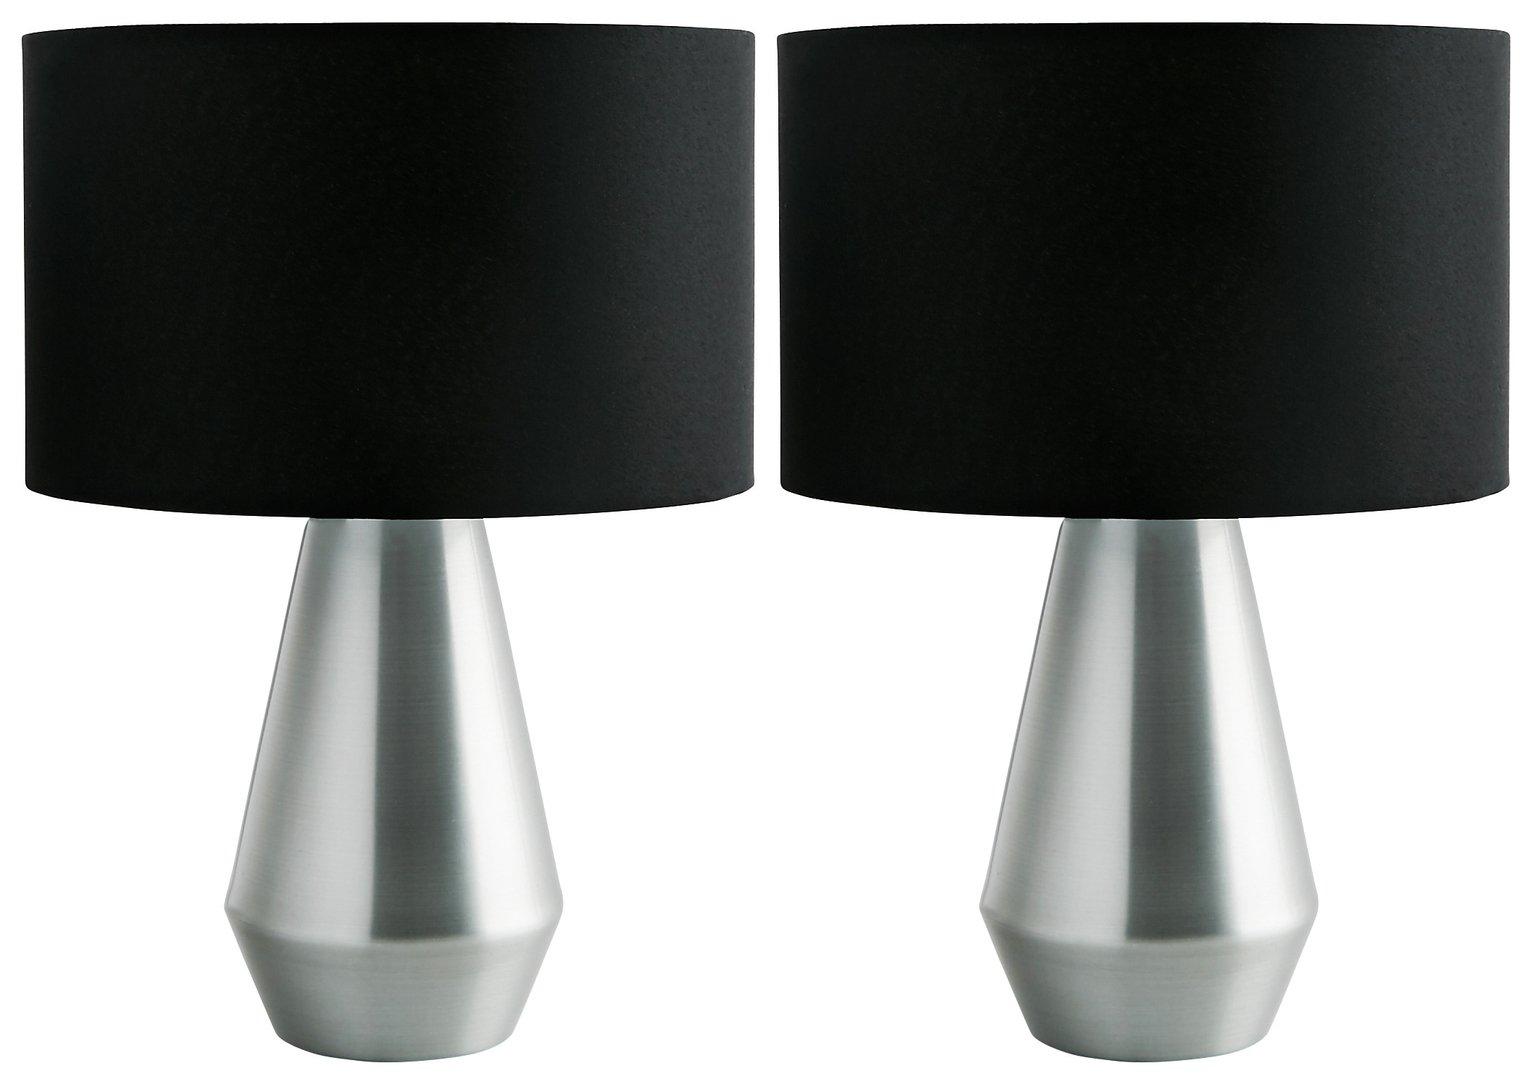 Habitat Maya Pair of Touch Table Lamps - Black